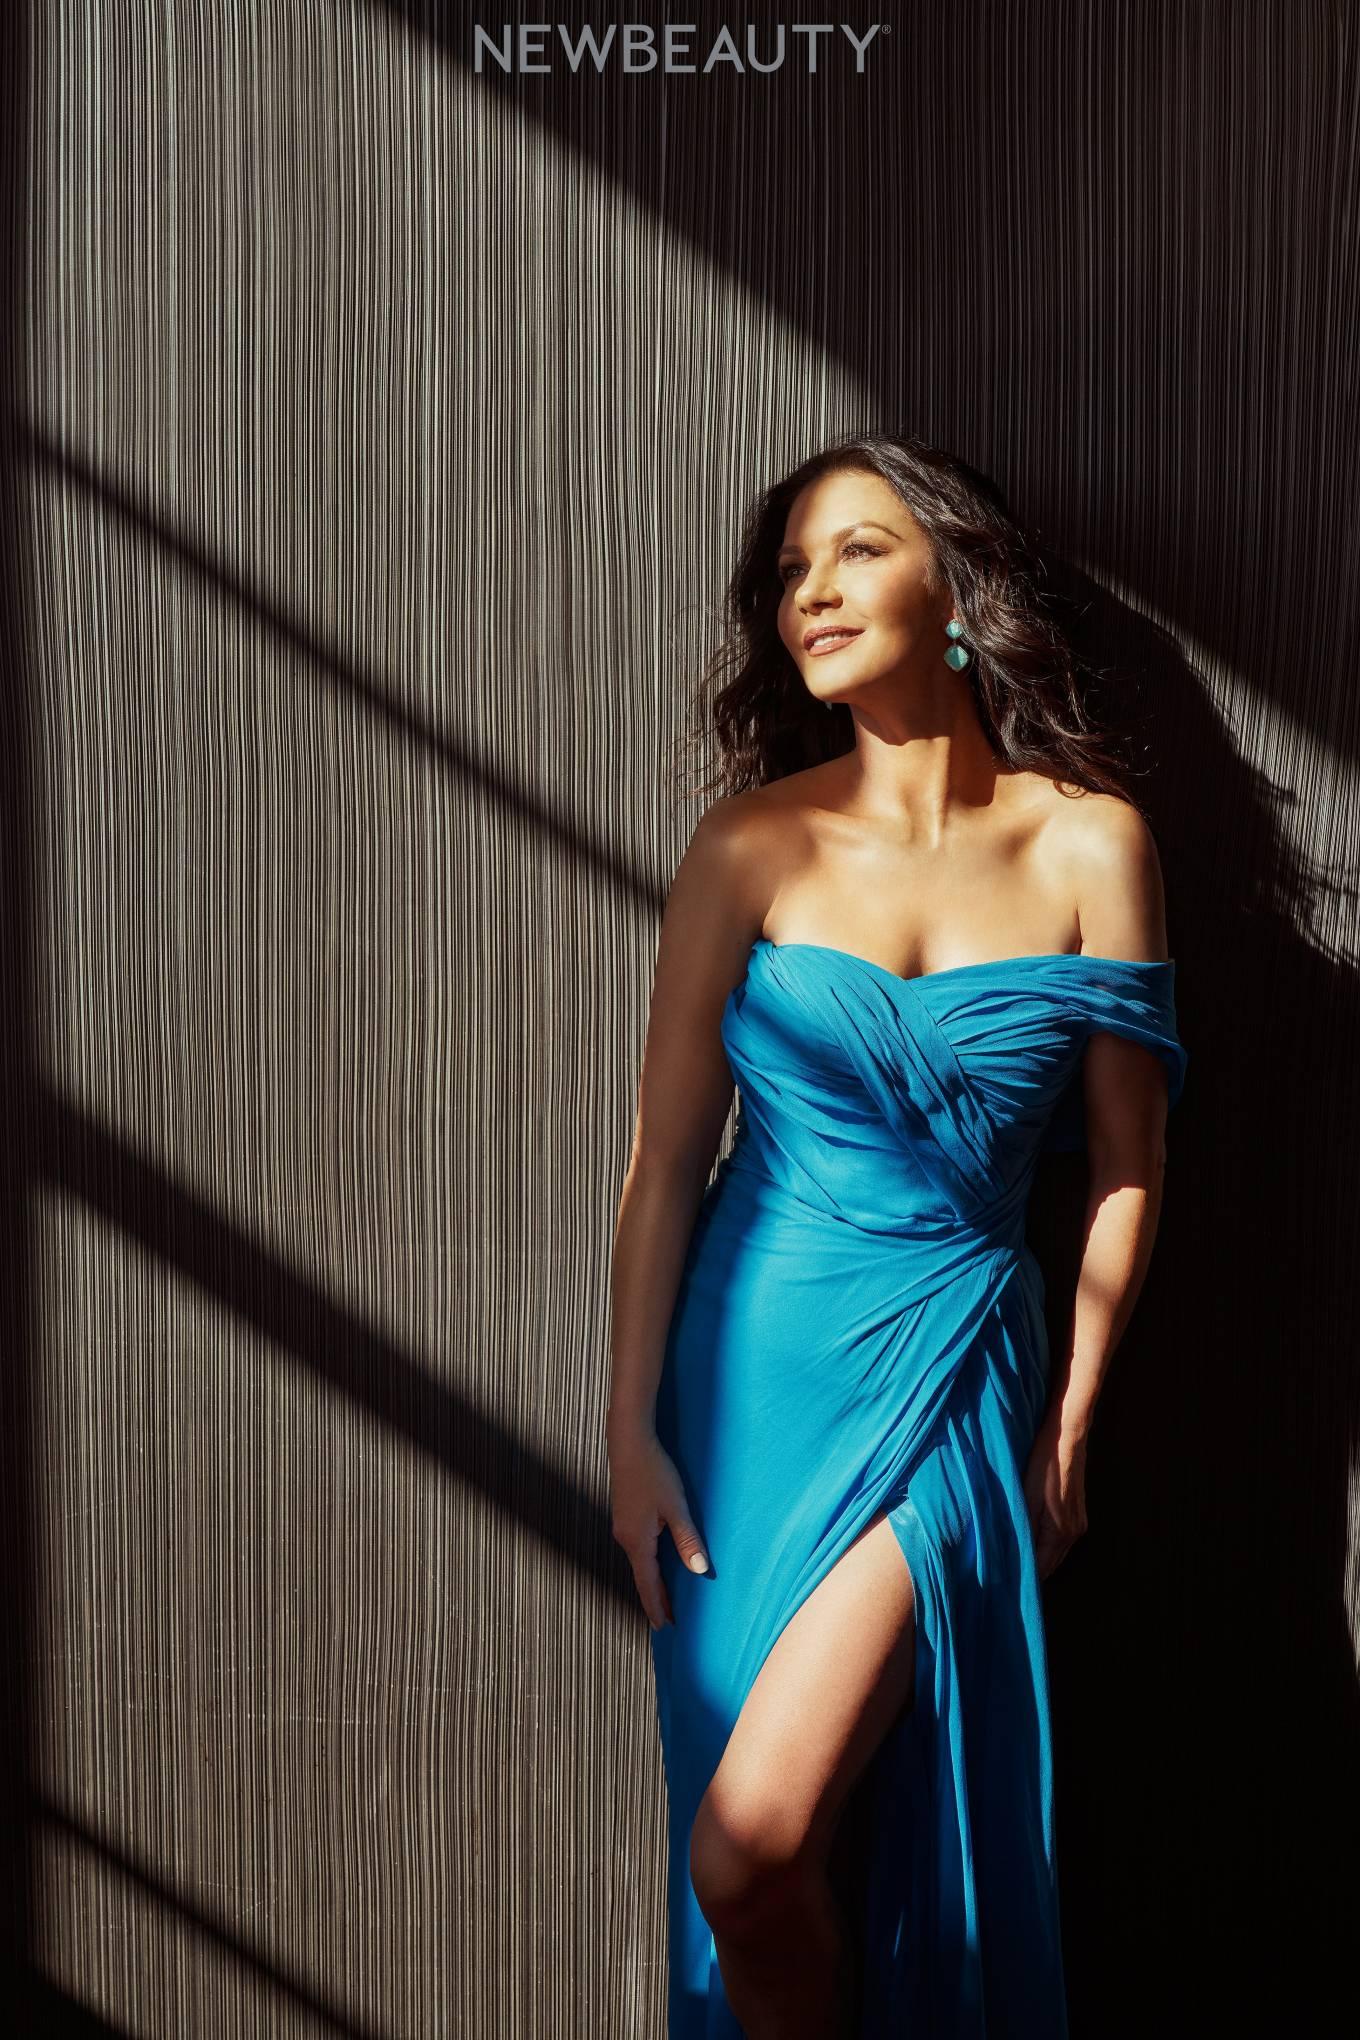 Catherine Zeta 2021 : Catherine Zeta-Jones – New Beauty magazine – March 2021-03